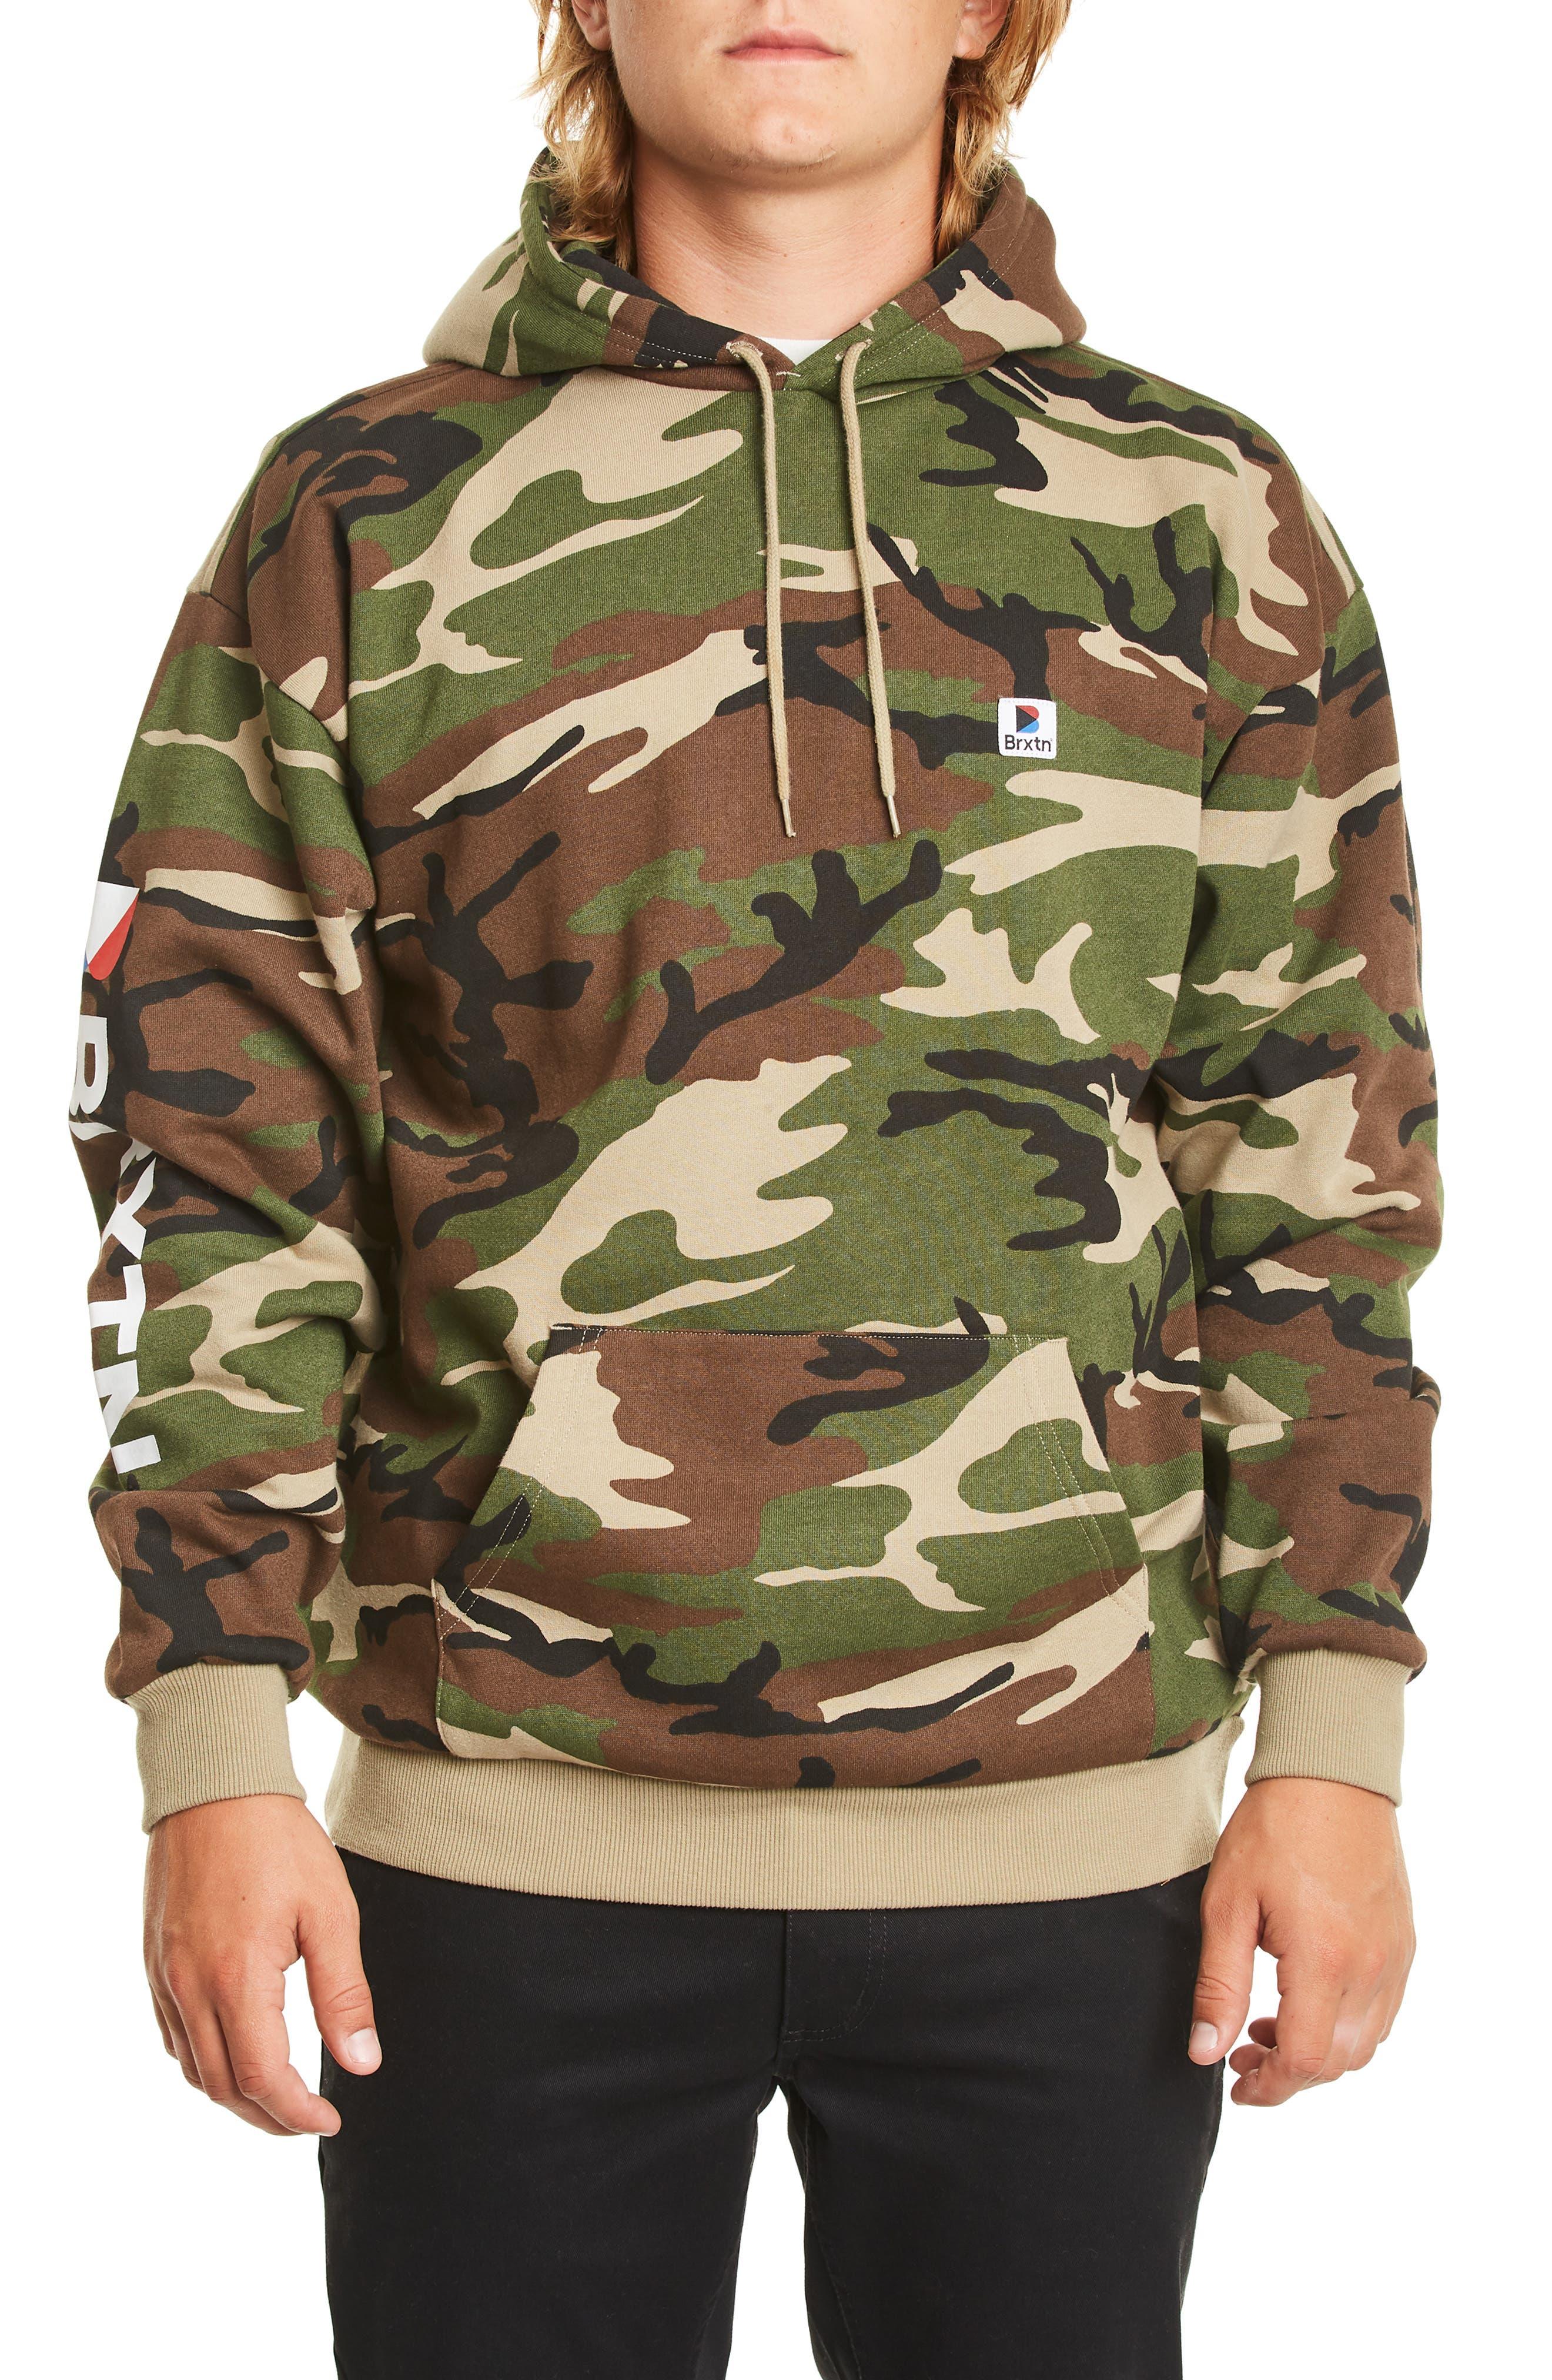 Stowell Hoodie Sweatshirt,                         Main,                         color, CAMO